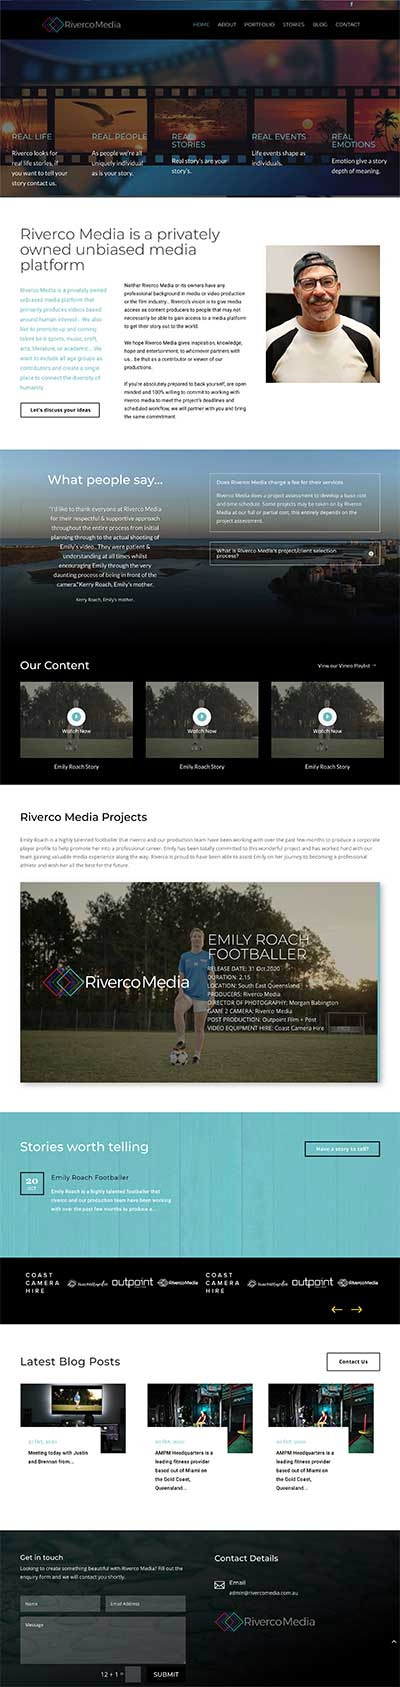 Best Media & Video Production websites Sunshine Coast